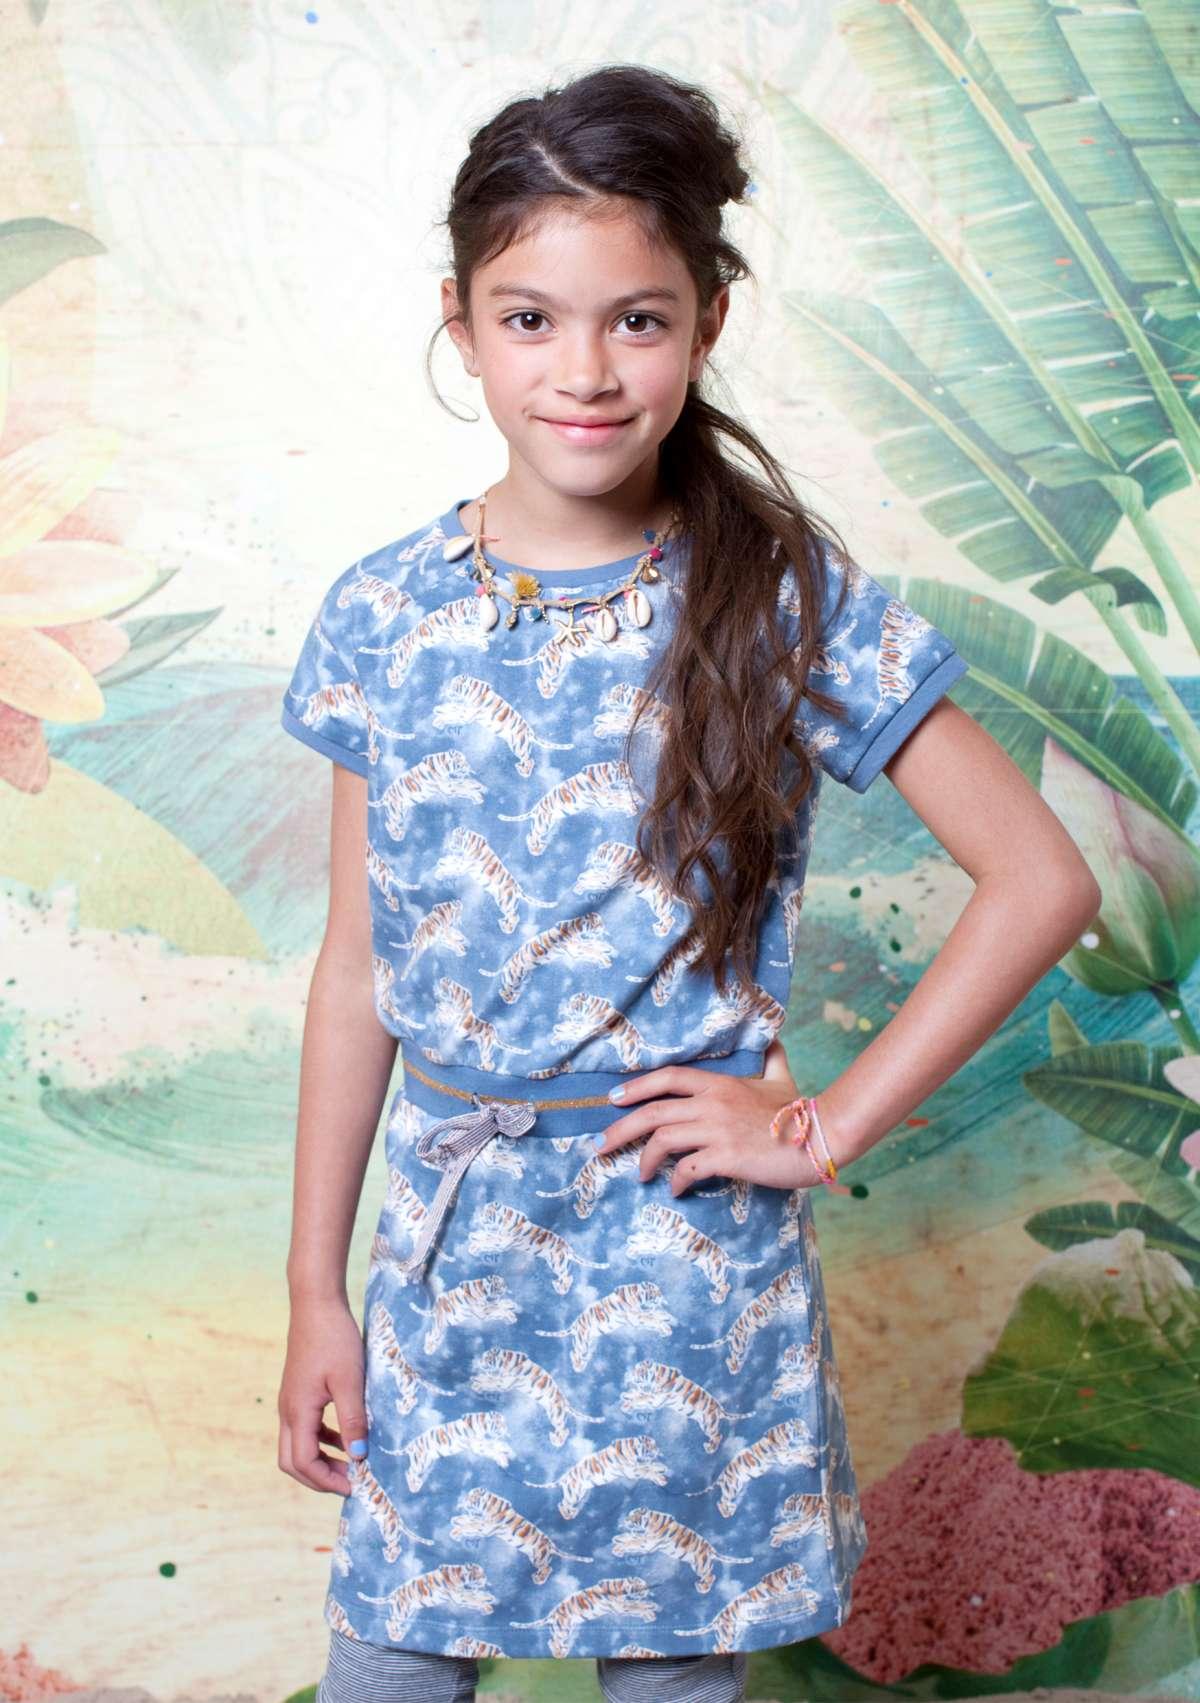 Moodstreet Kinderkleding.Moodstreet Kinderkleding Meisjes Kleding Zomer Collectie 2018 Ss18